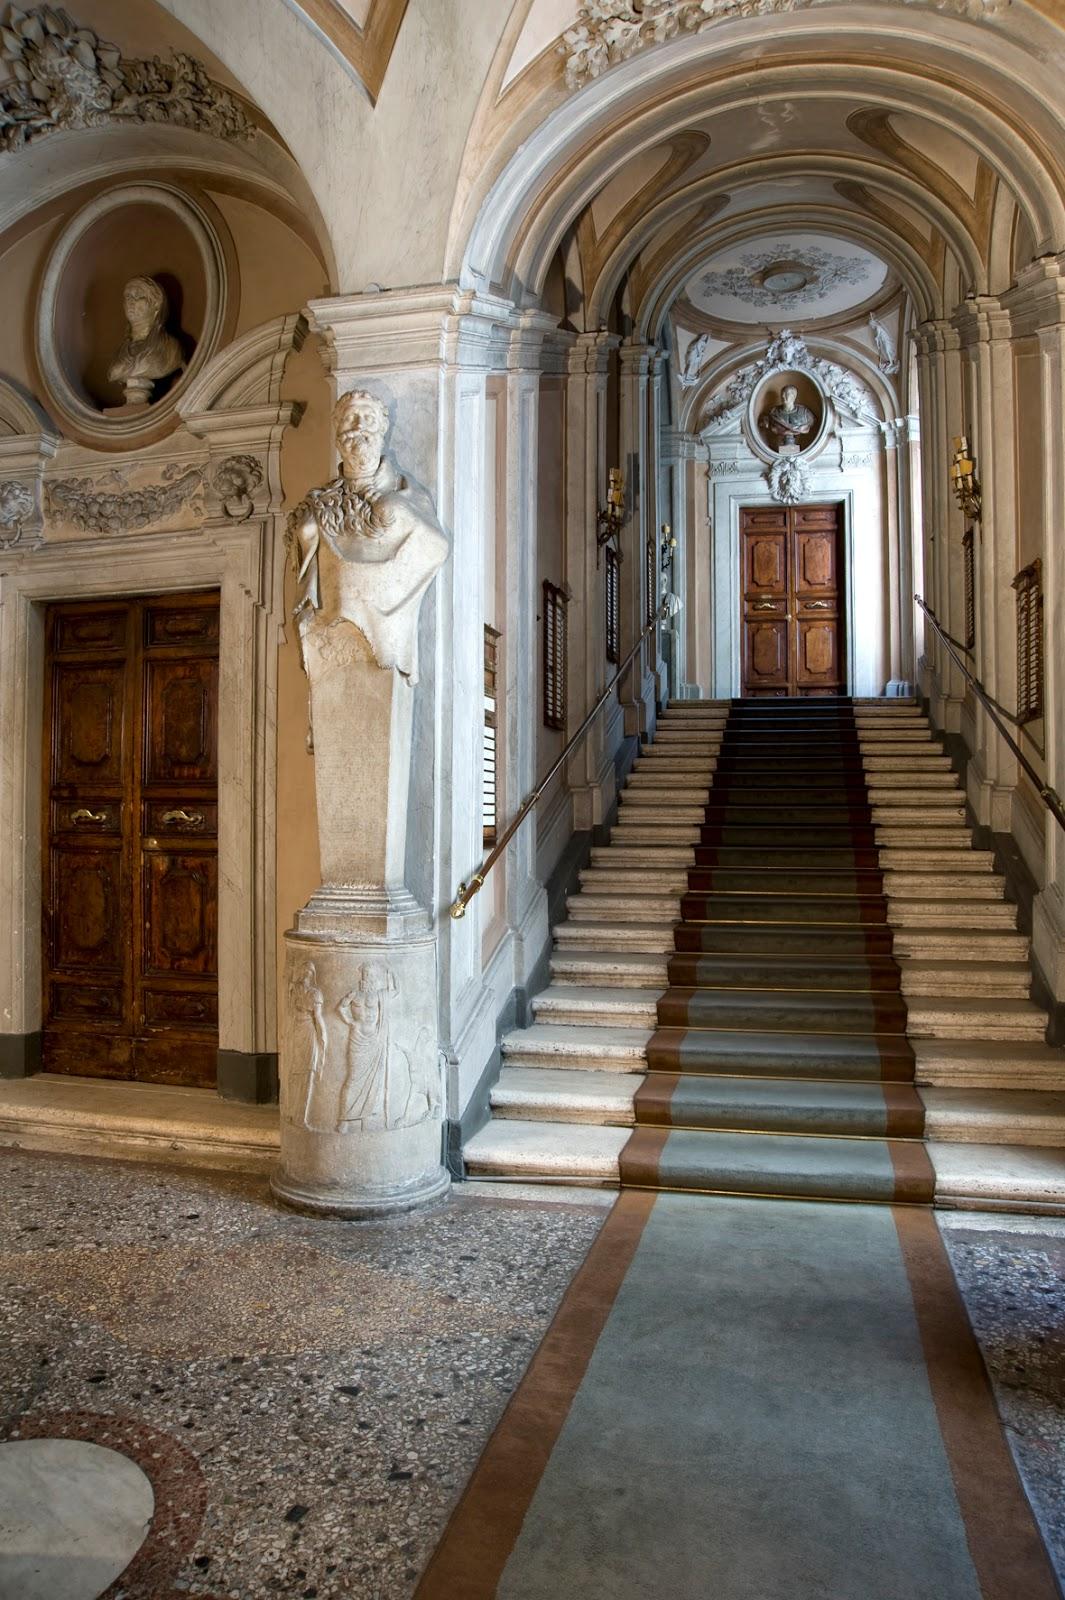 Courtyard of Palazzo Rondanini